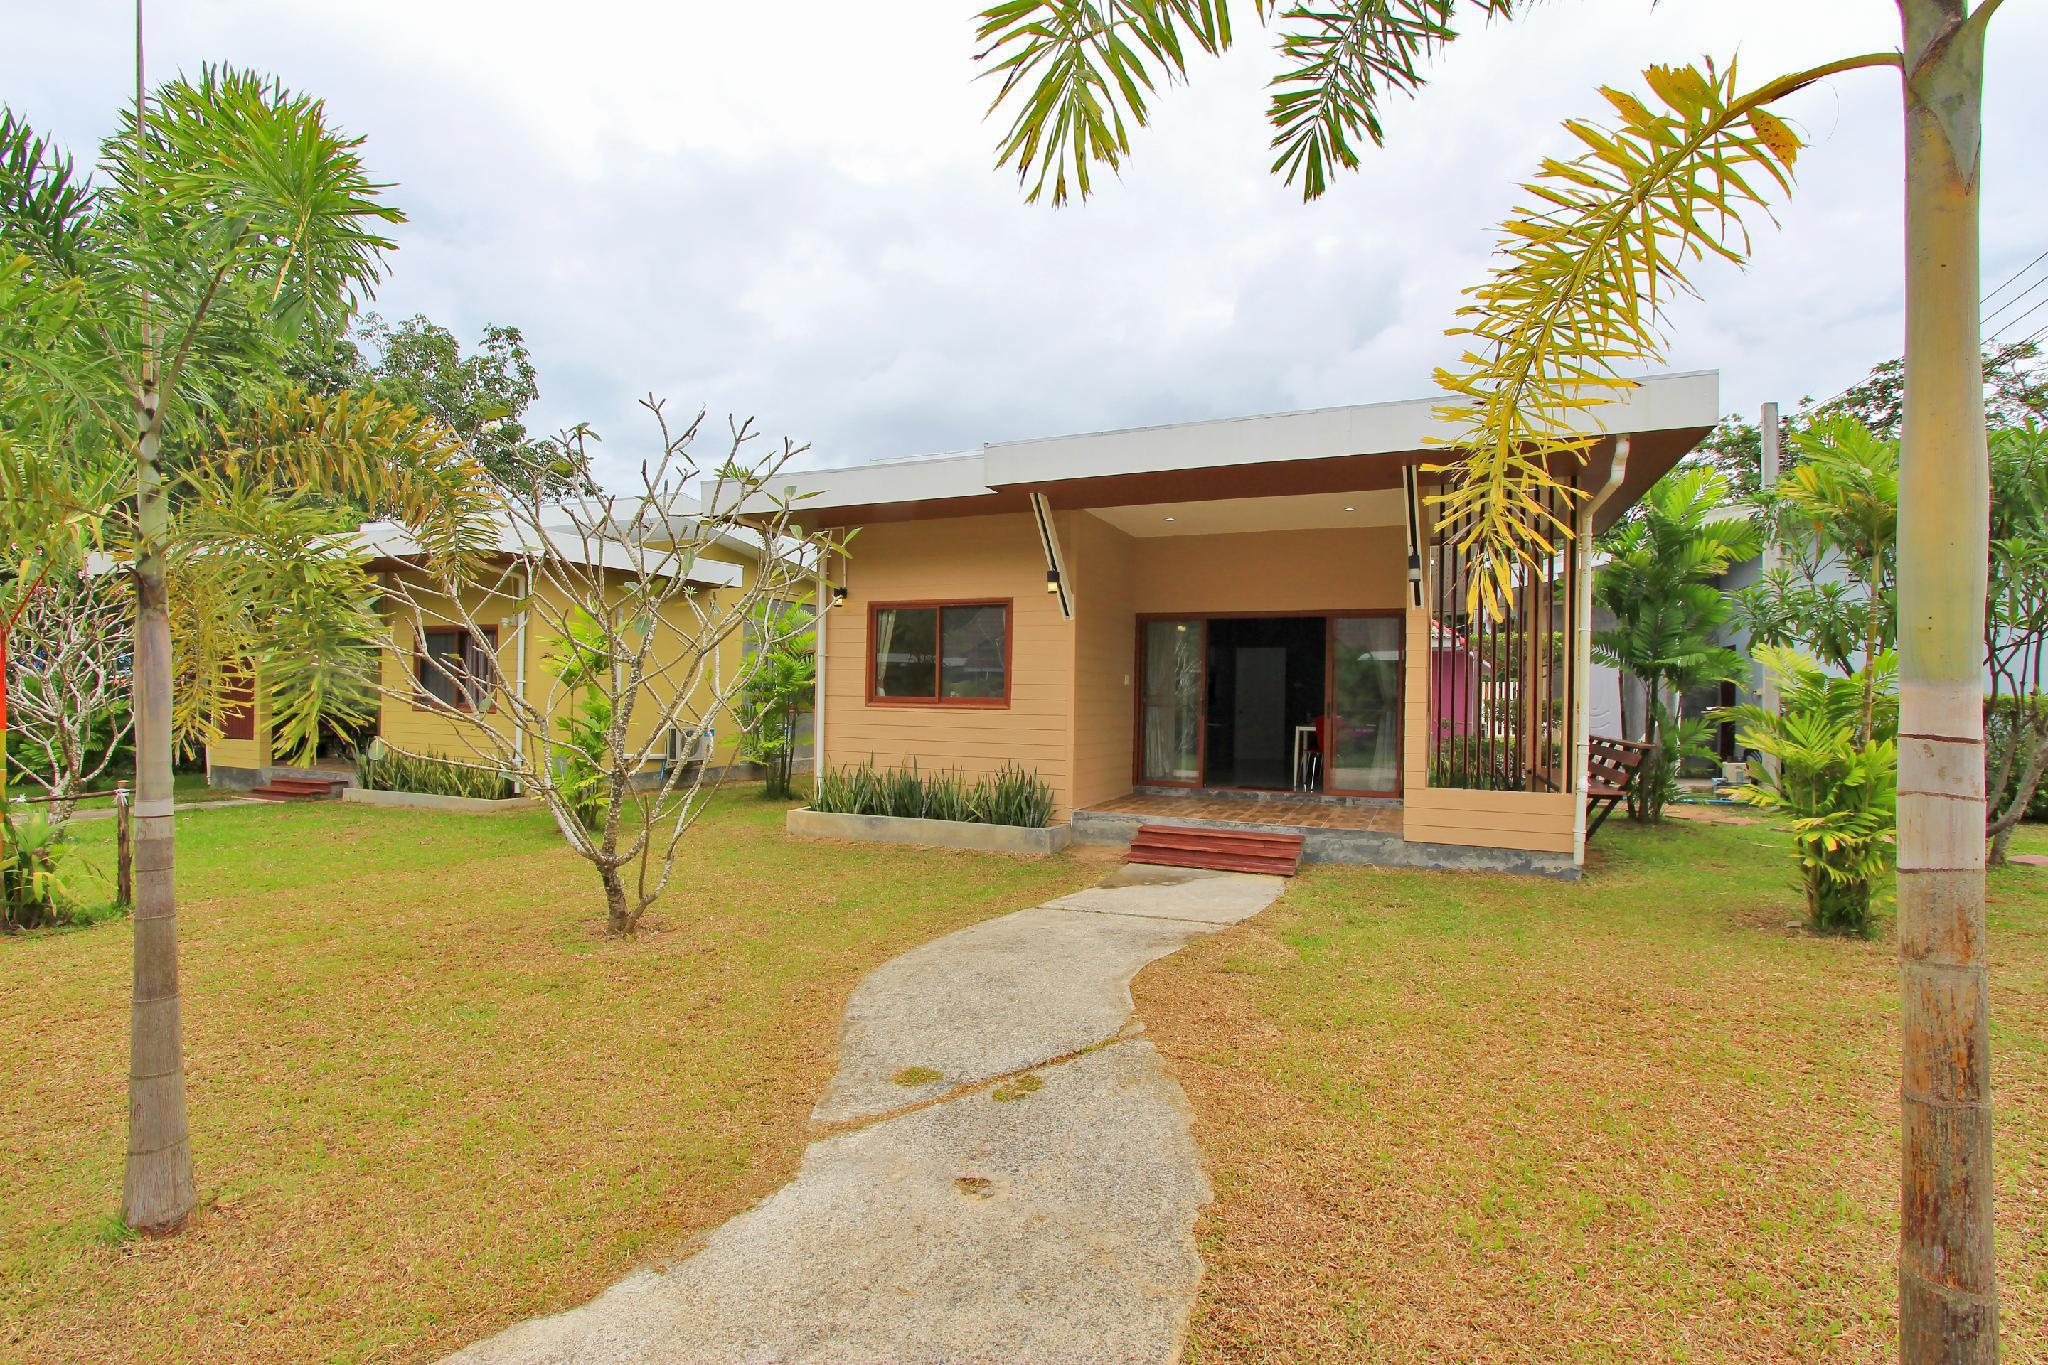 Bungalow 2 Bedroom Near Phuket Airport บังกะโล 2 ห้องนอน 1 ห้องน้ำส่วนตัว ขนาด 80 ตร.ม. – ไม้ขาว